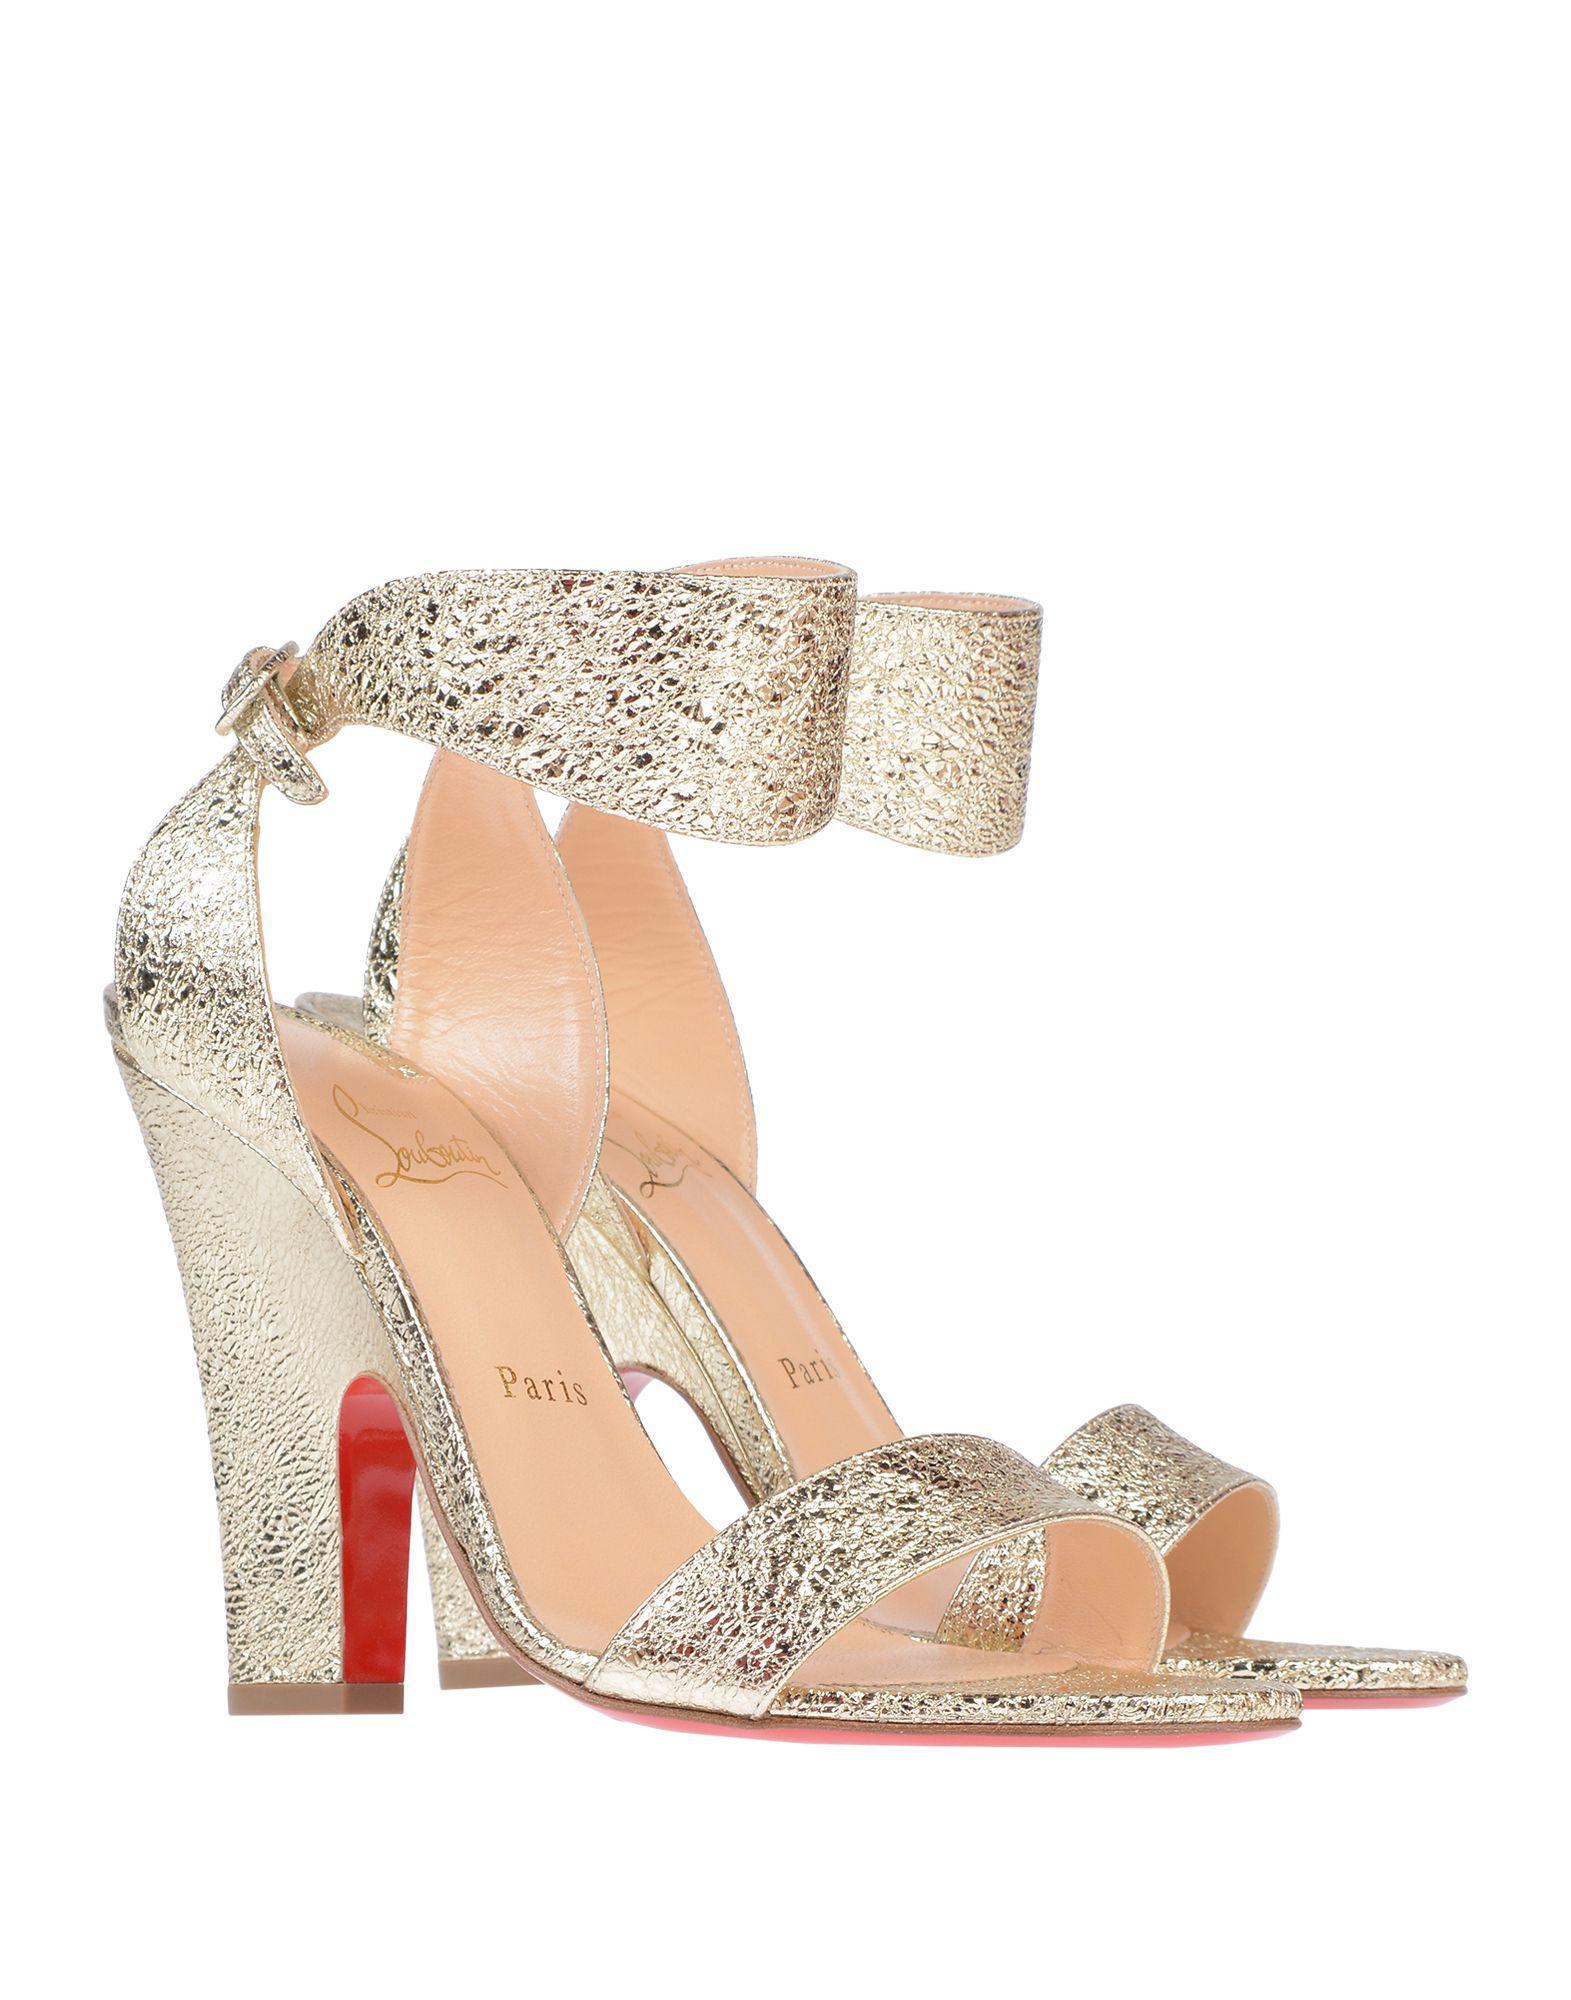 e3ad8c90ec0 Lyst - Christian Louboutin Sandals in Metallic